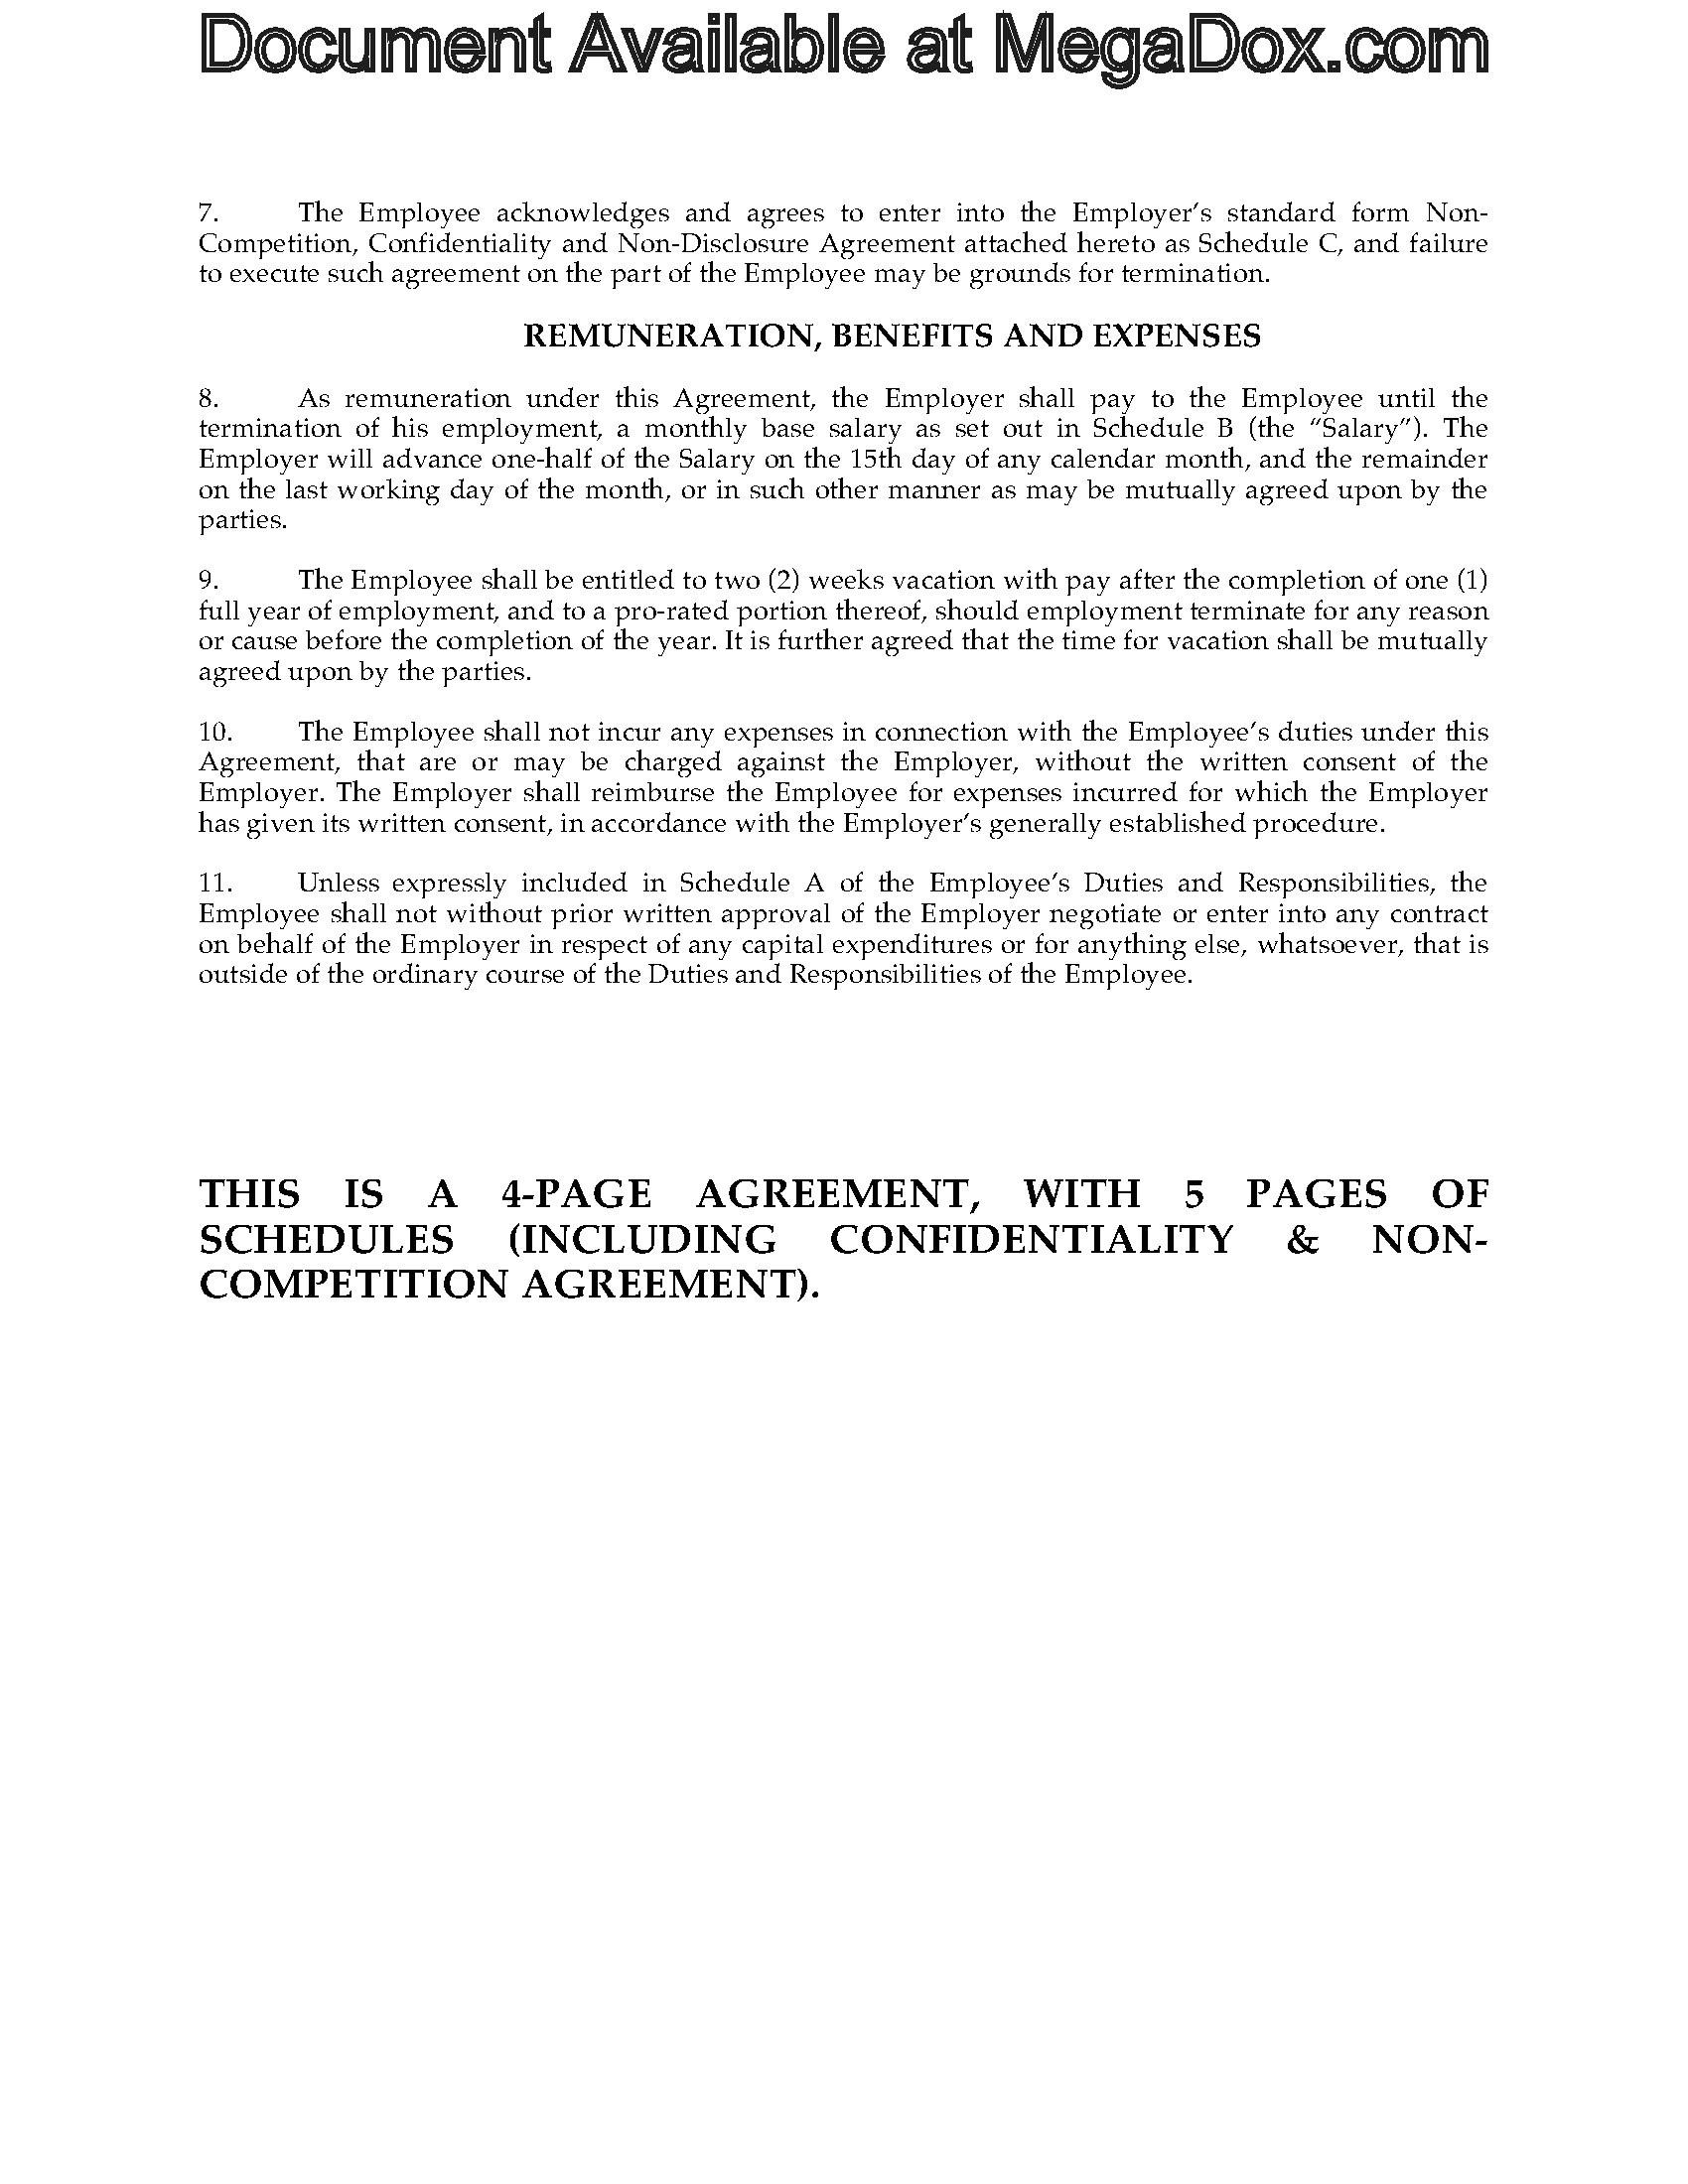 canada employment agreement